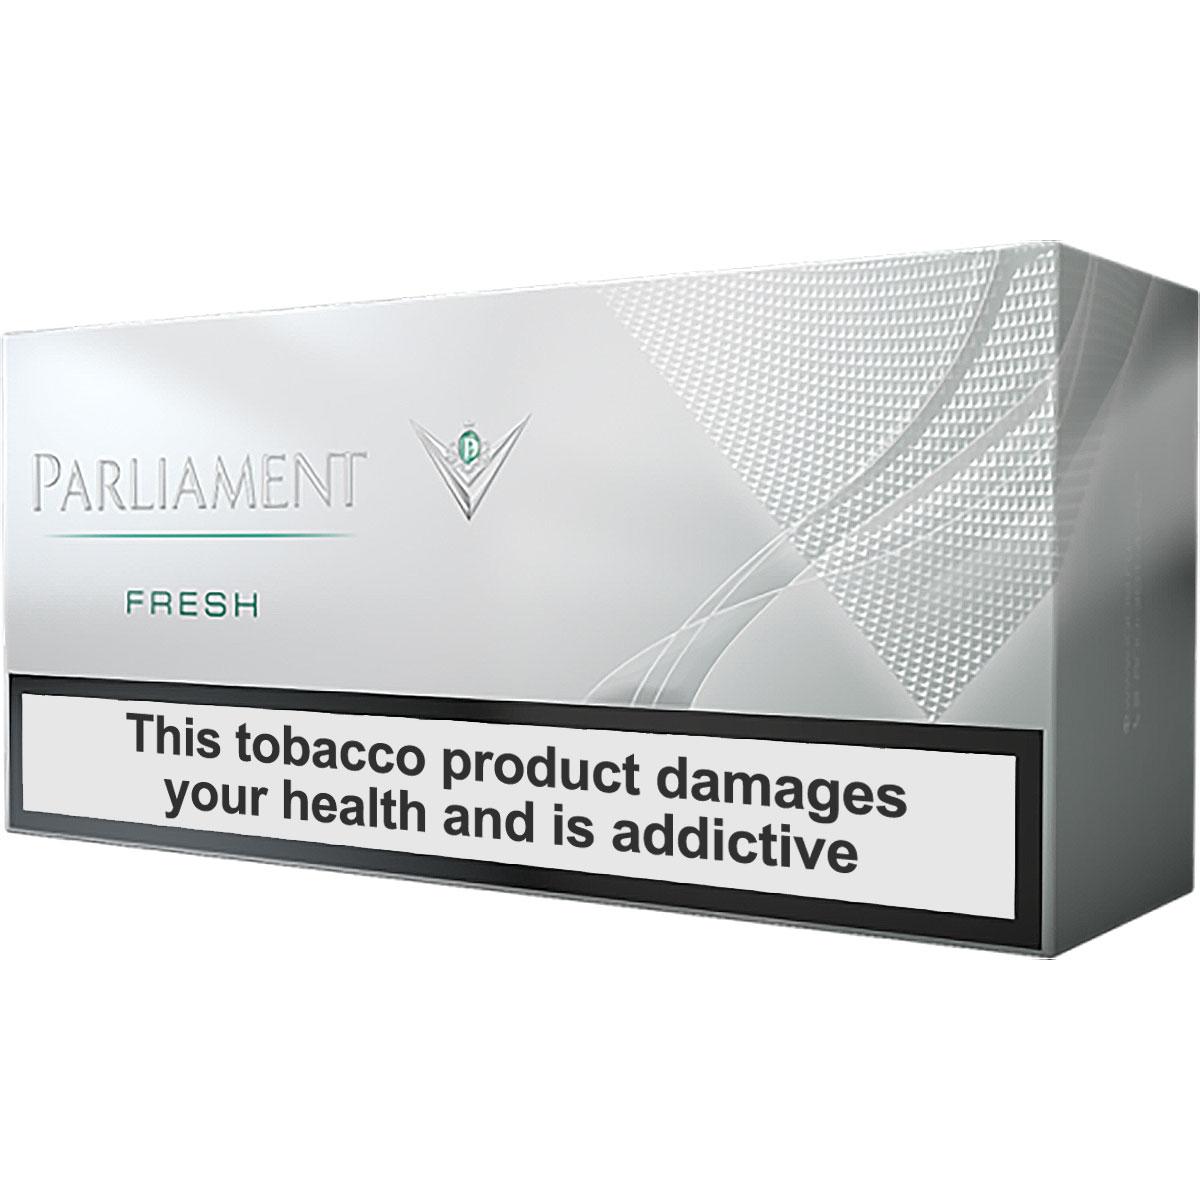 Parliament - Fresh Limited Edition